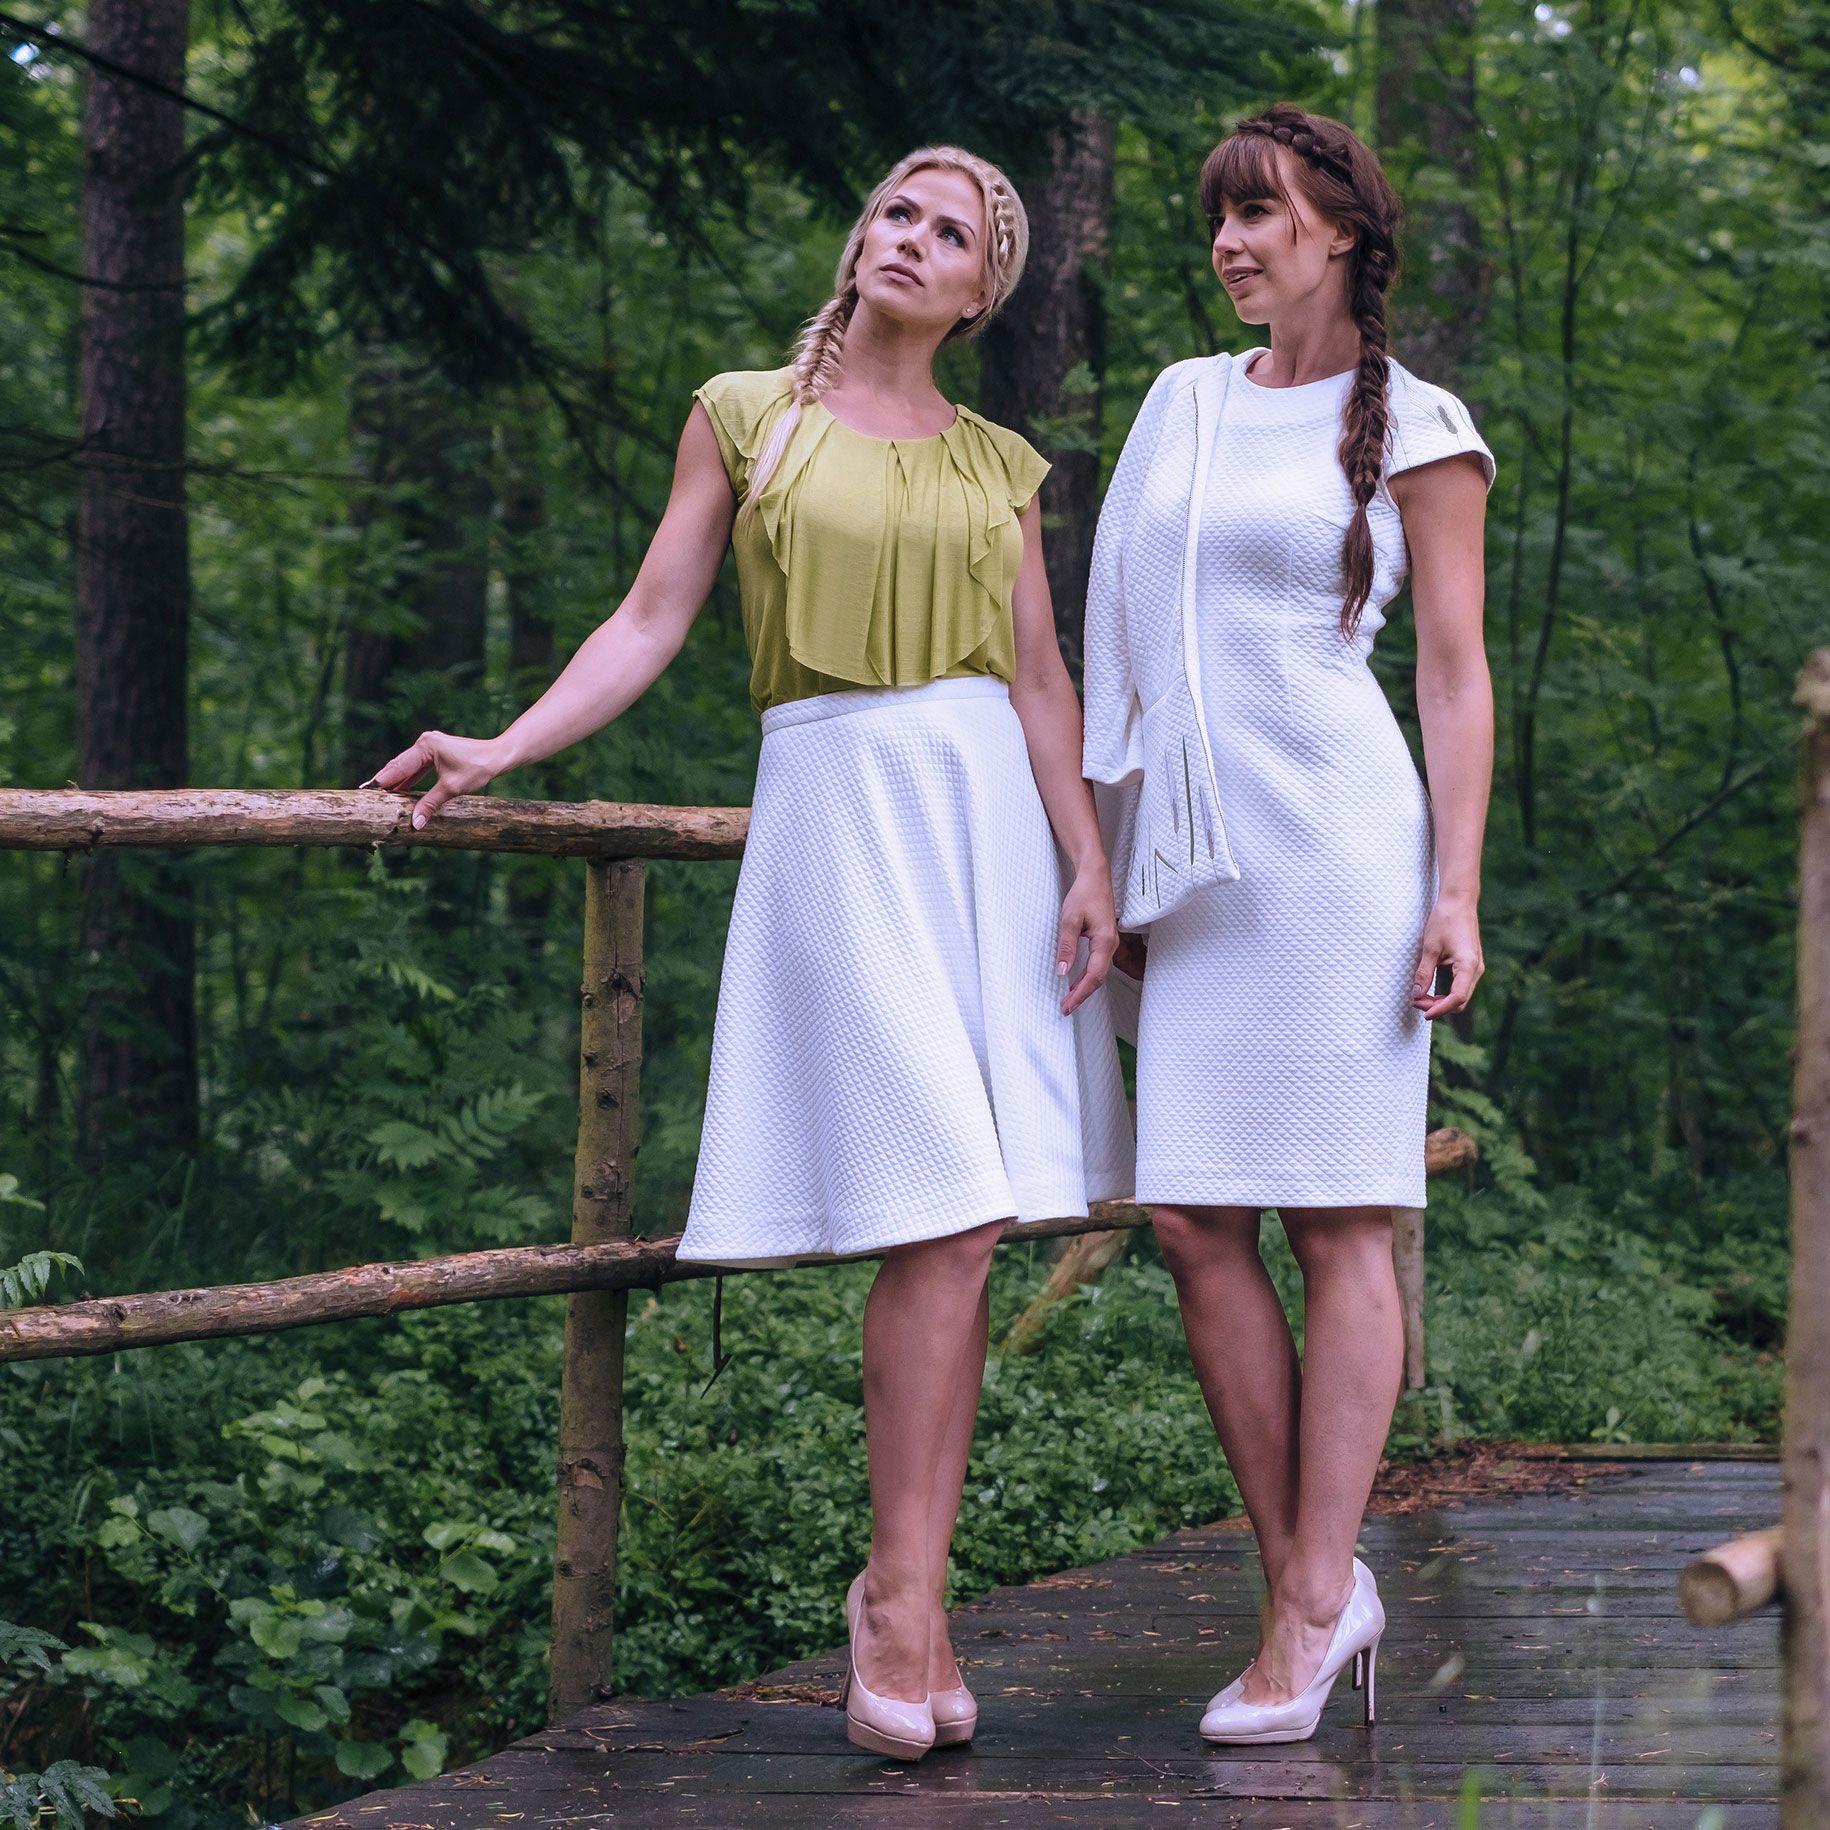 KiRiVOO HIRSS Organic Cotton Dress, RUKIS Skirt and NISU organic silk blouse.